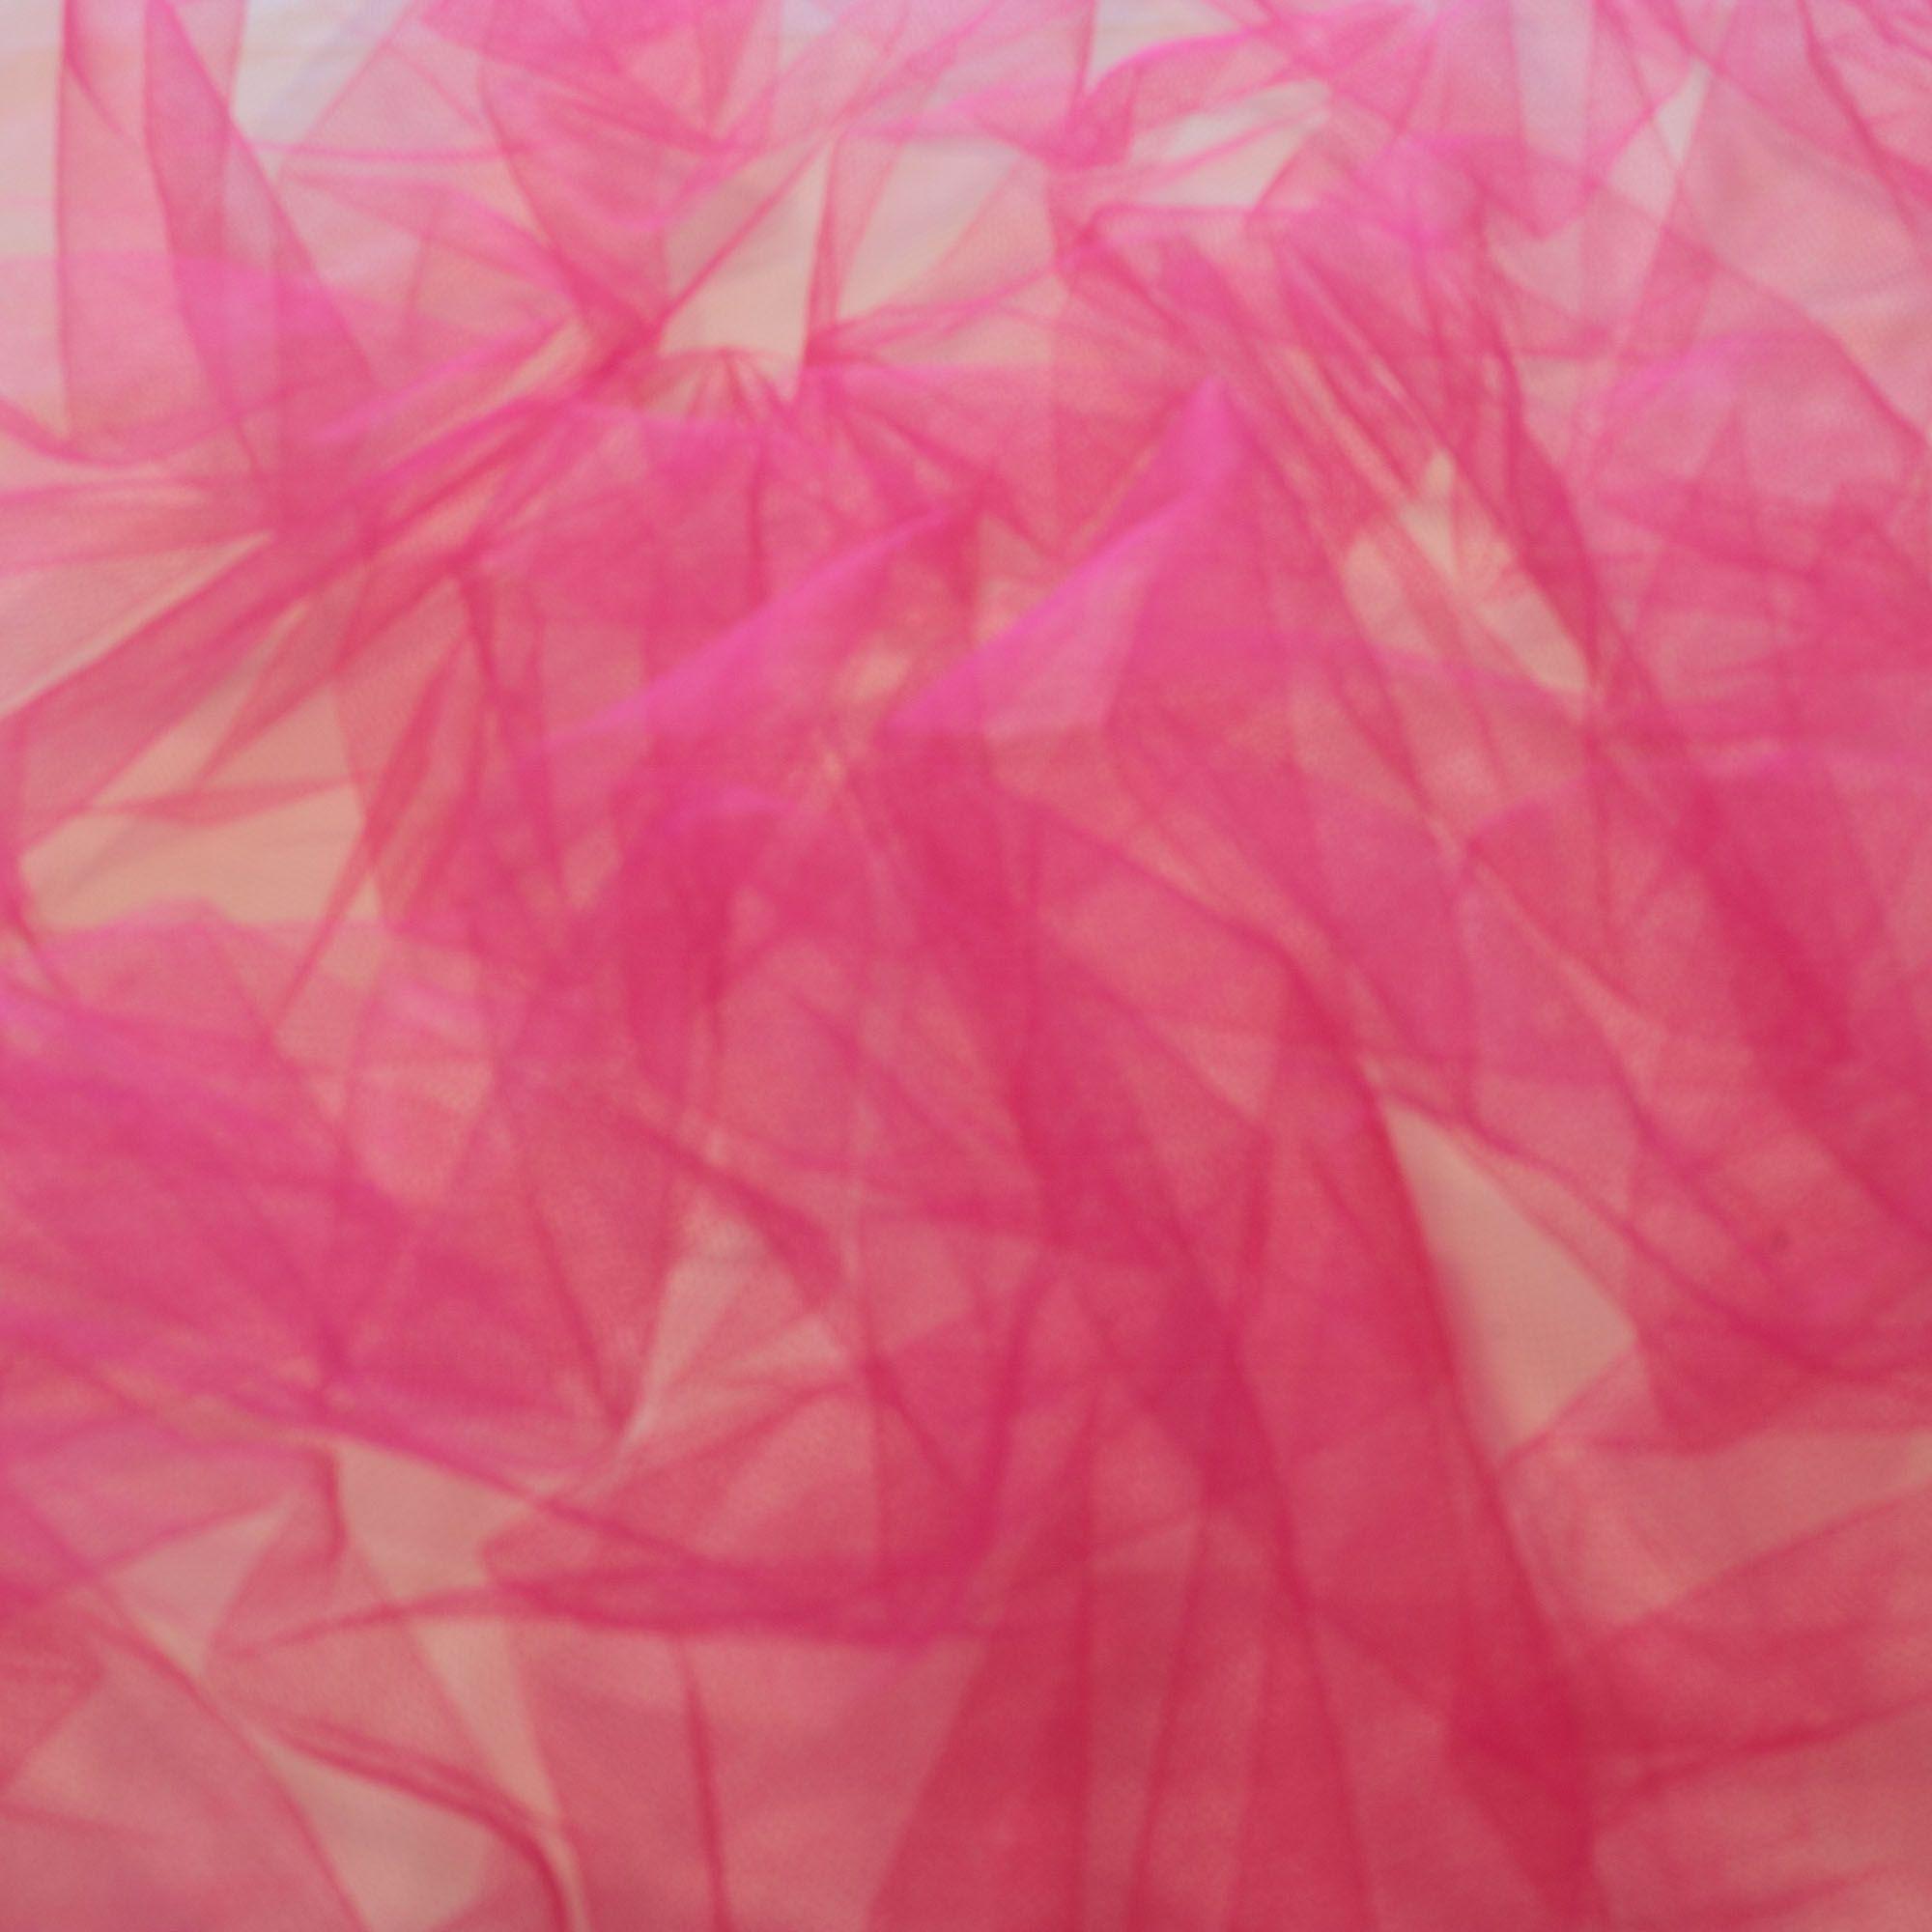 Tecido Tule Rosa Pink 100% Poliester 1,20 m Largura